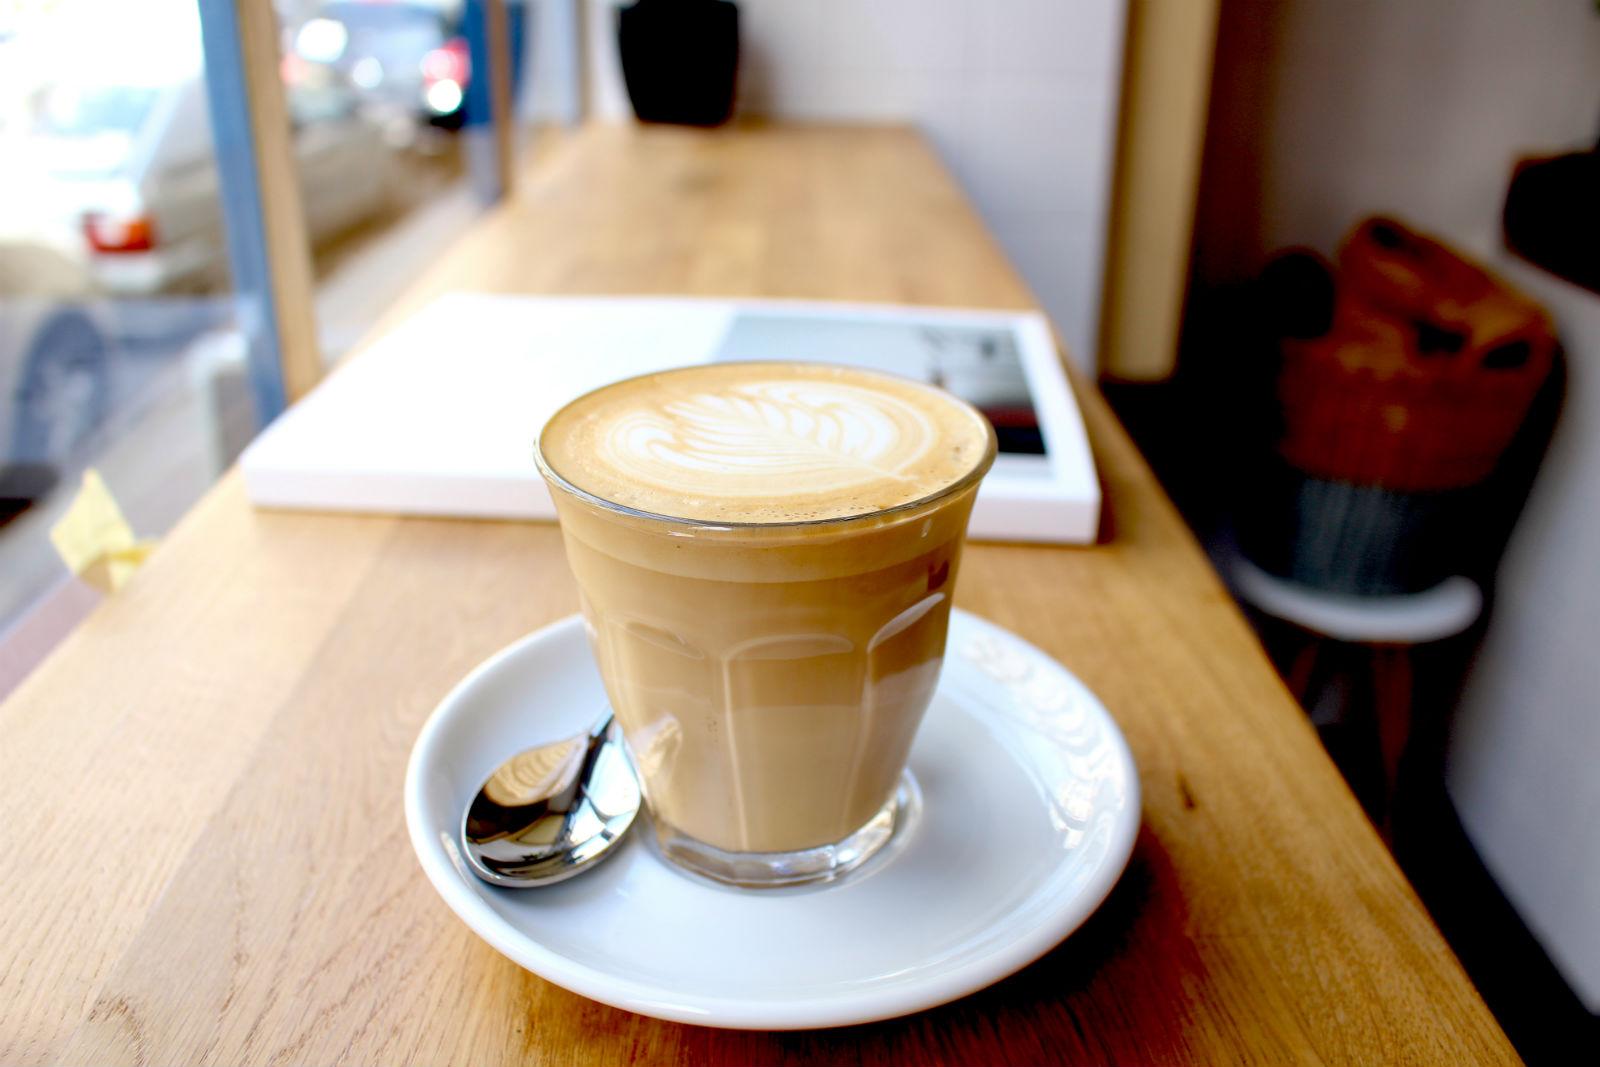 HiP Paris blog. Cafe Oberkampf. Latte made with Coutume coffee.